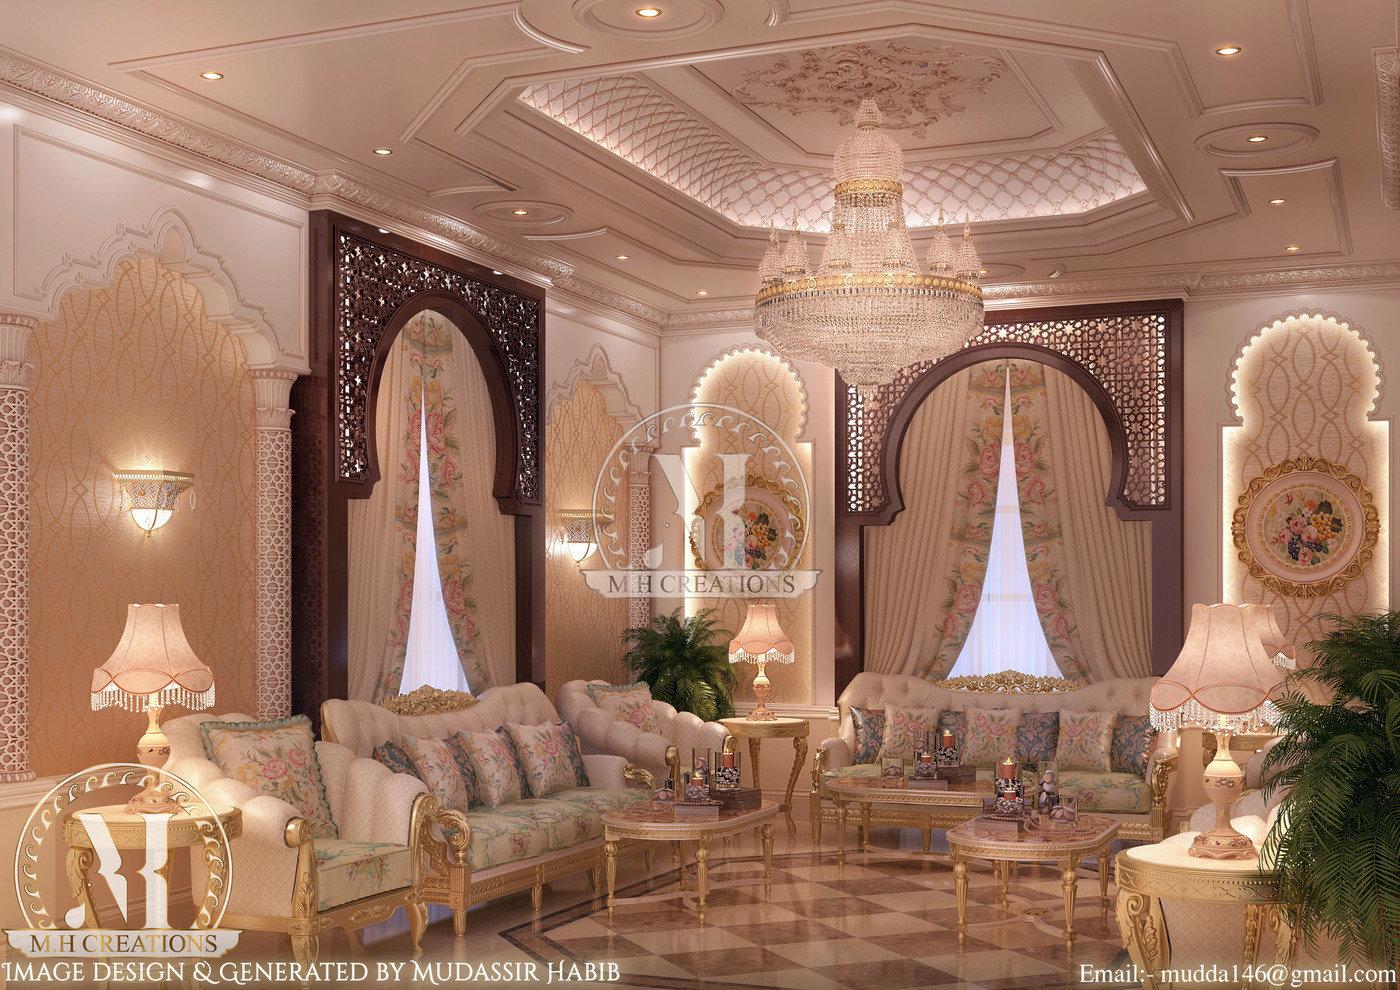 Moroccan Style Interior By Mudassir Habib Shaikh At